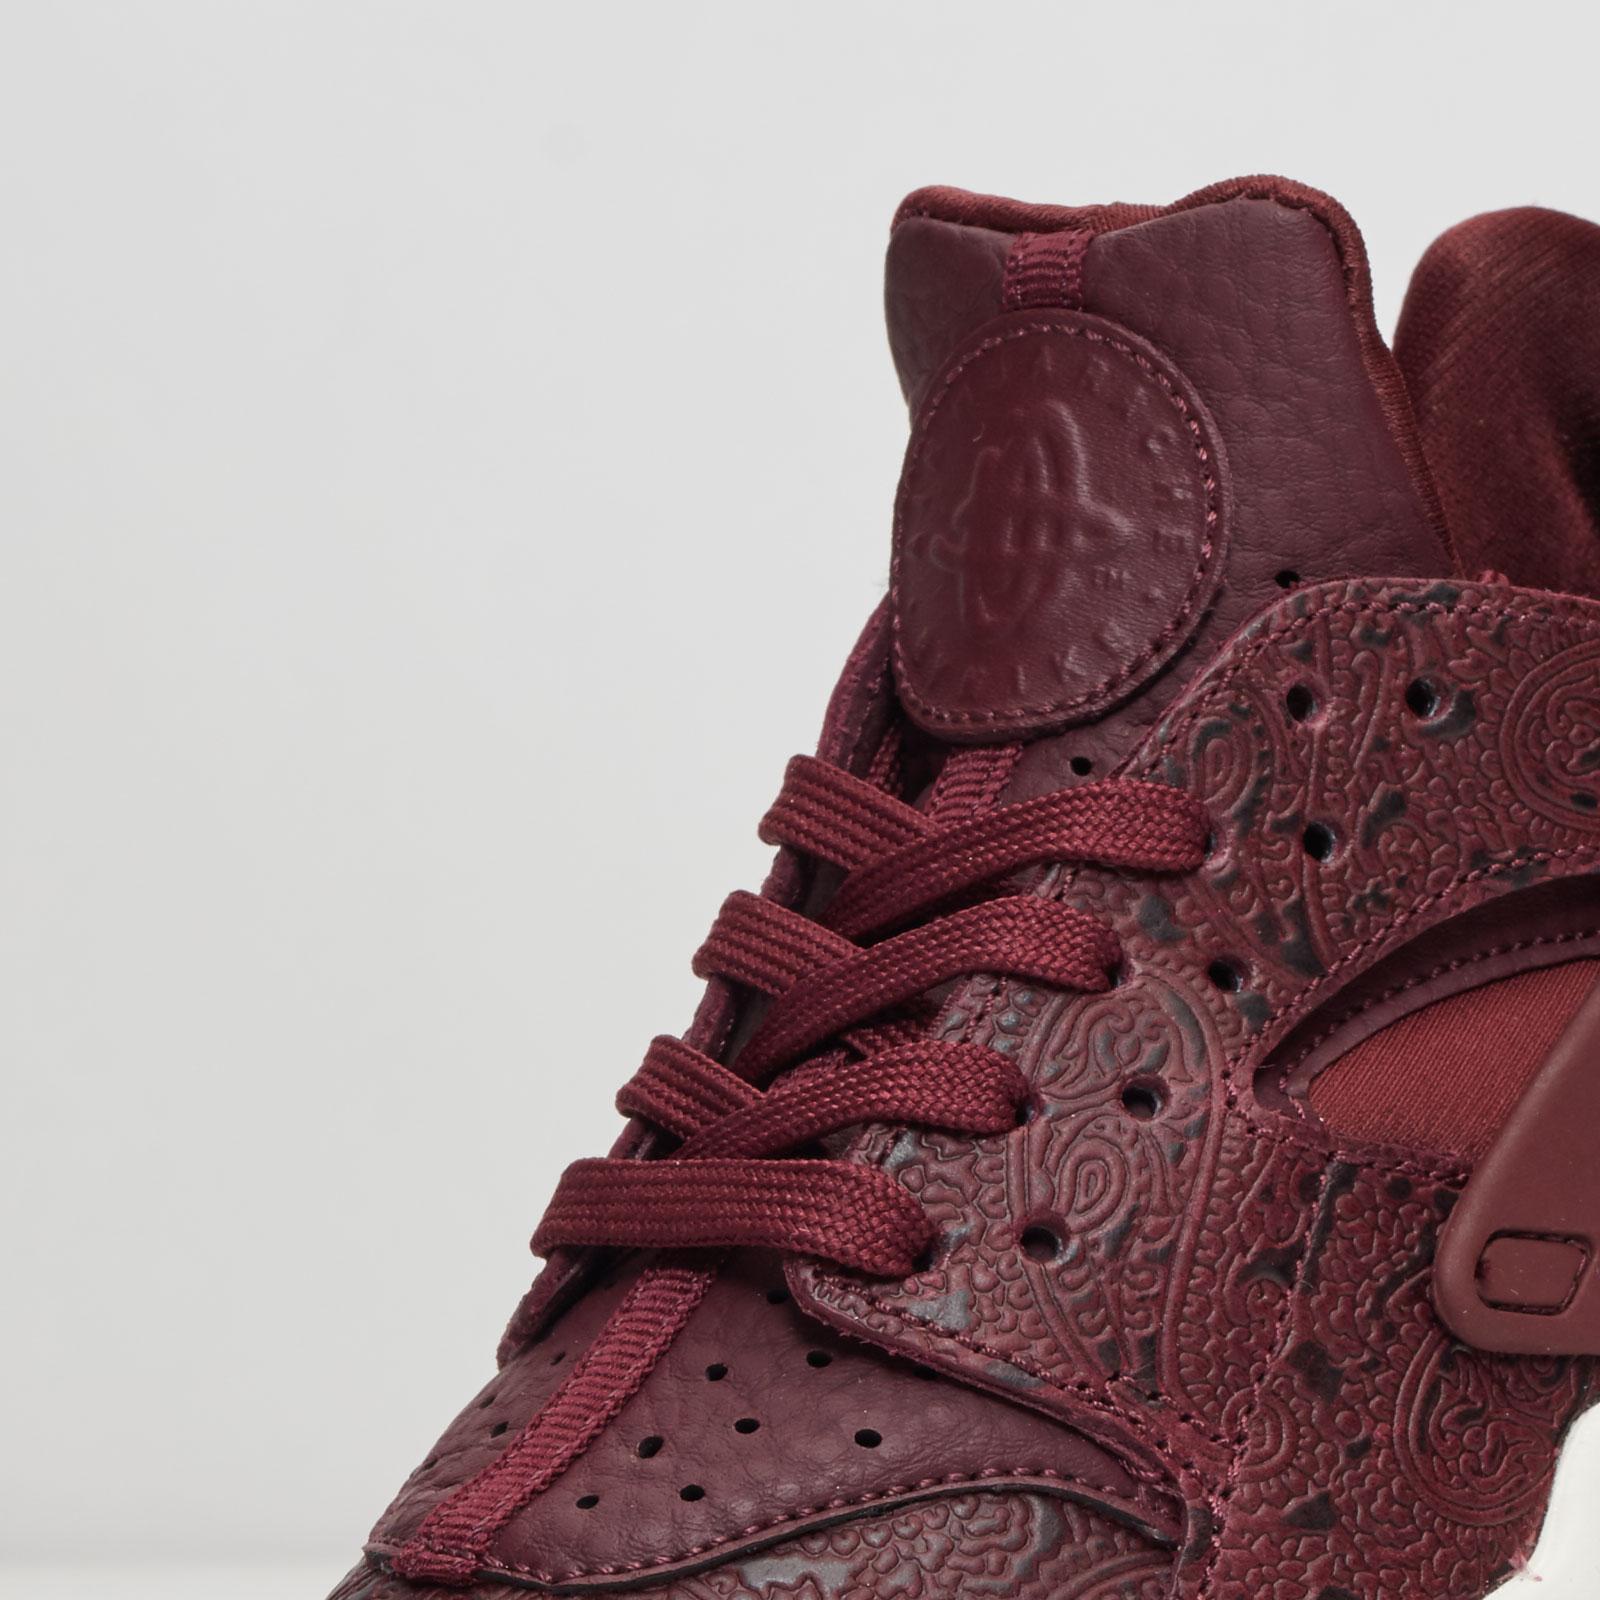 new product 351da be7da Nike Wmns Air Huarache Run Premium - 683818-600 - Sneakersnstuff   sneakers    streetwear online since 1999